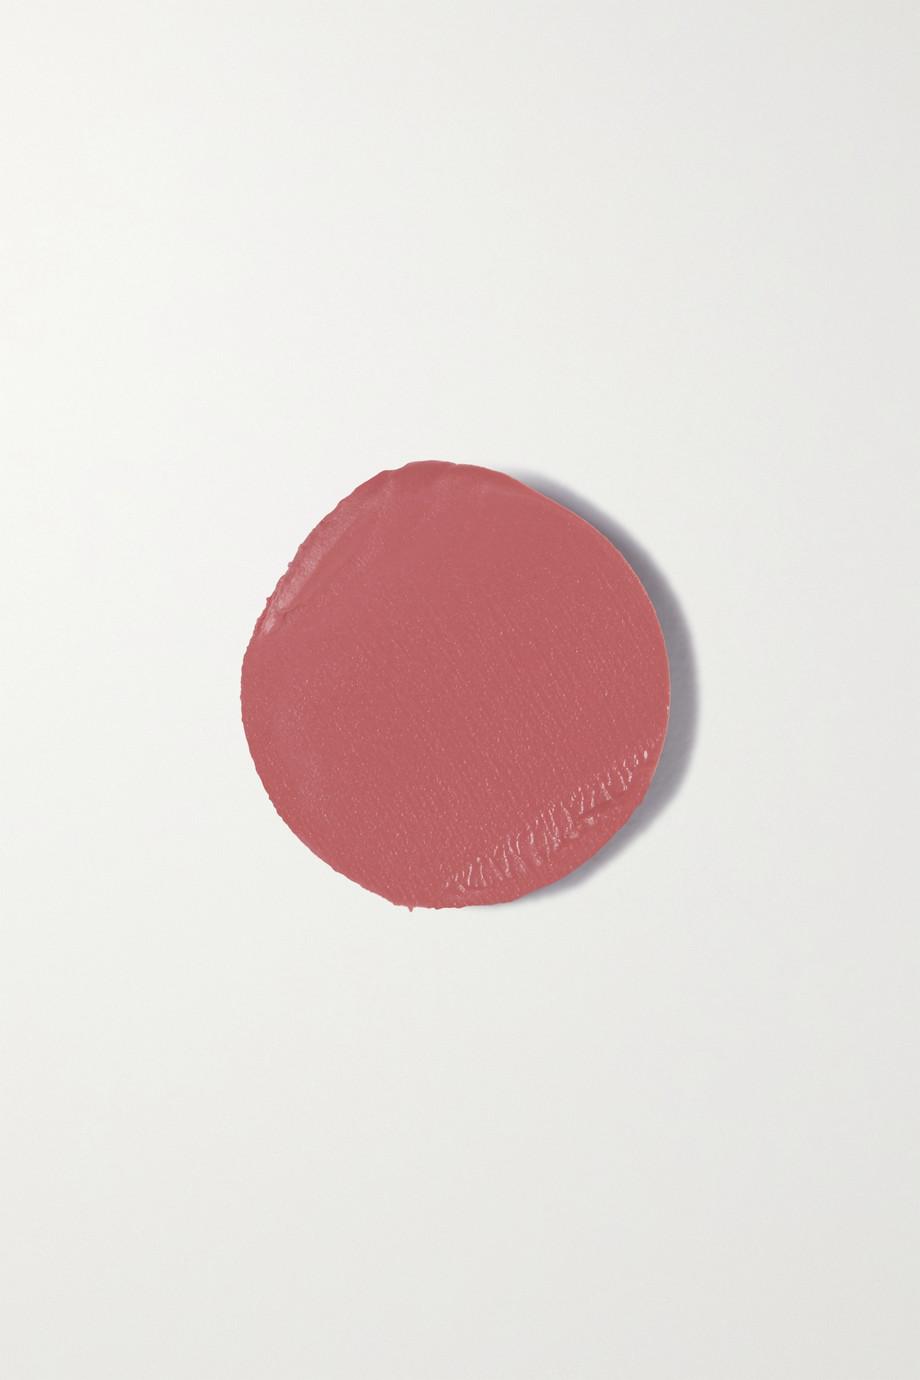 Victoria Beckham Beauty Posh Lipstick – Pout – Lippenstift